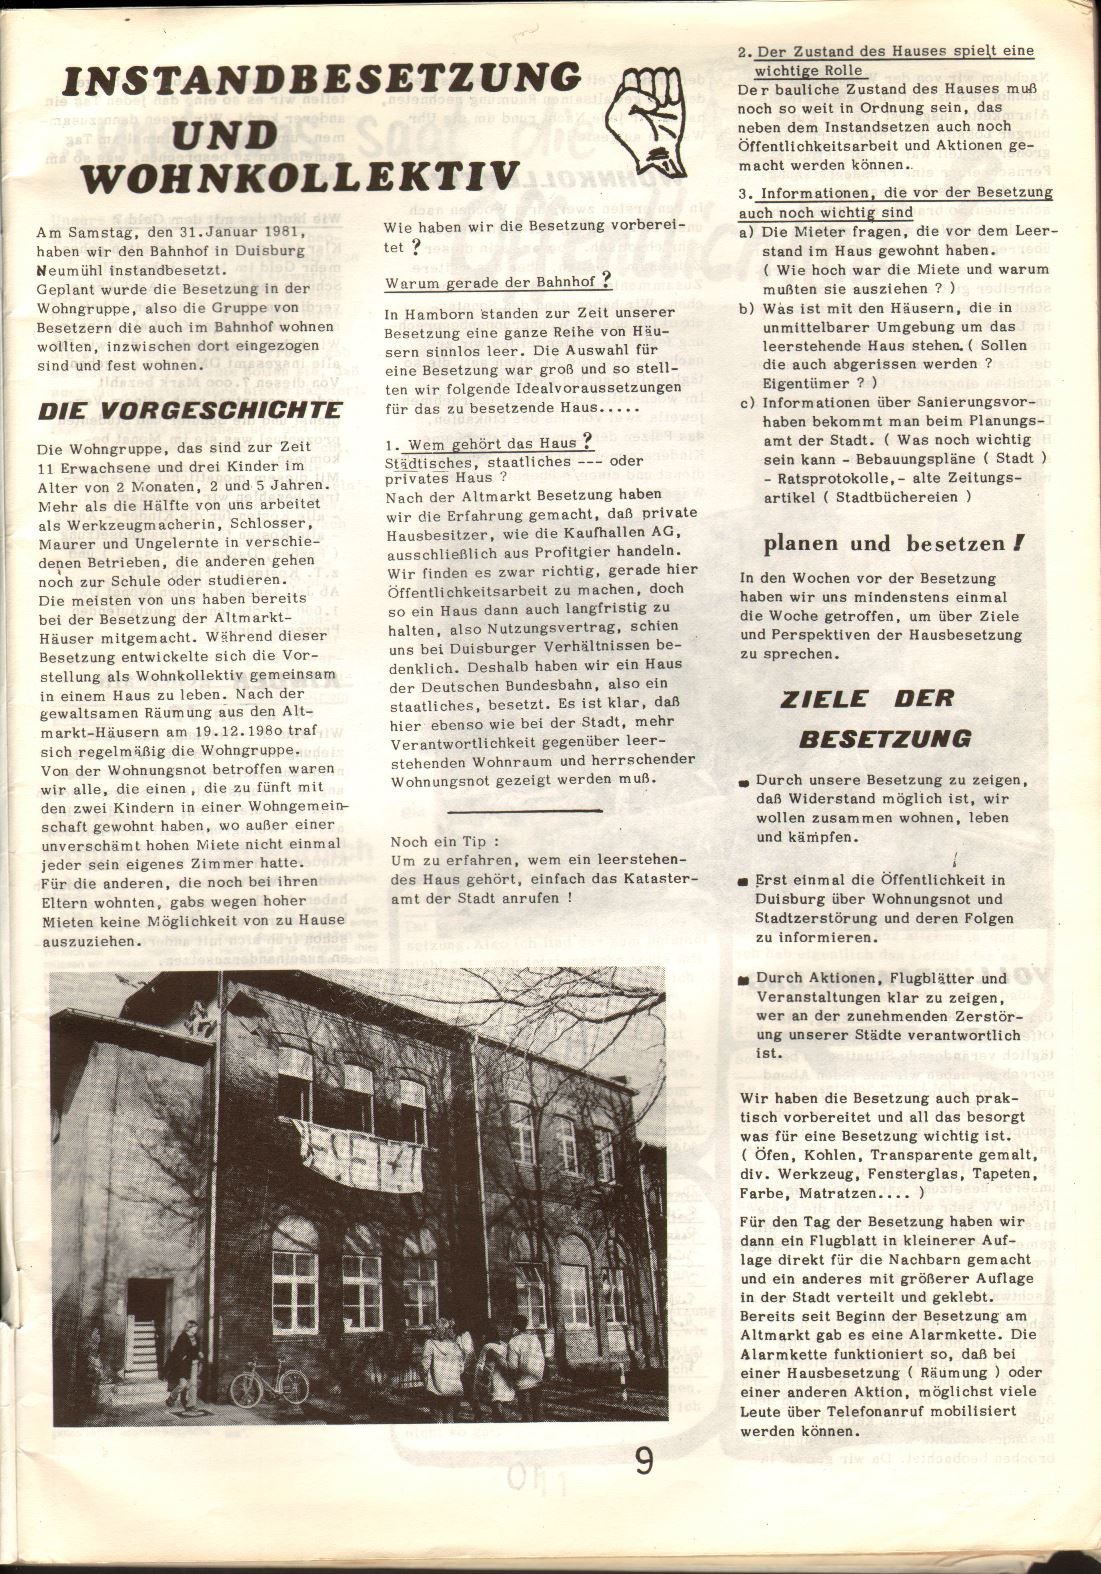 Duisburg_1981_Doku_Neumuehler_Bahnhof_09